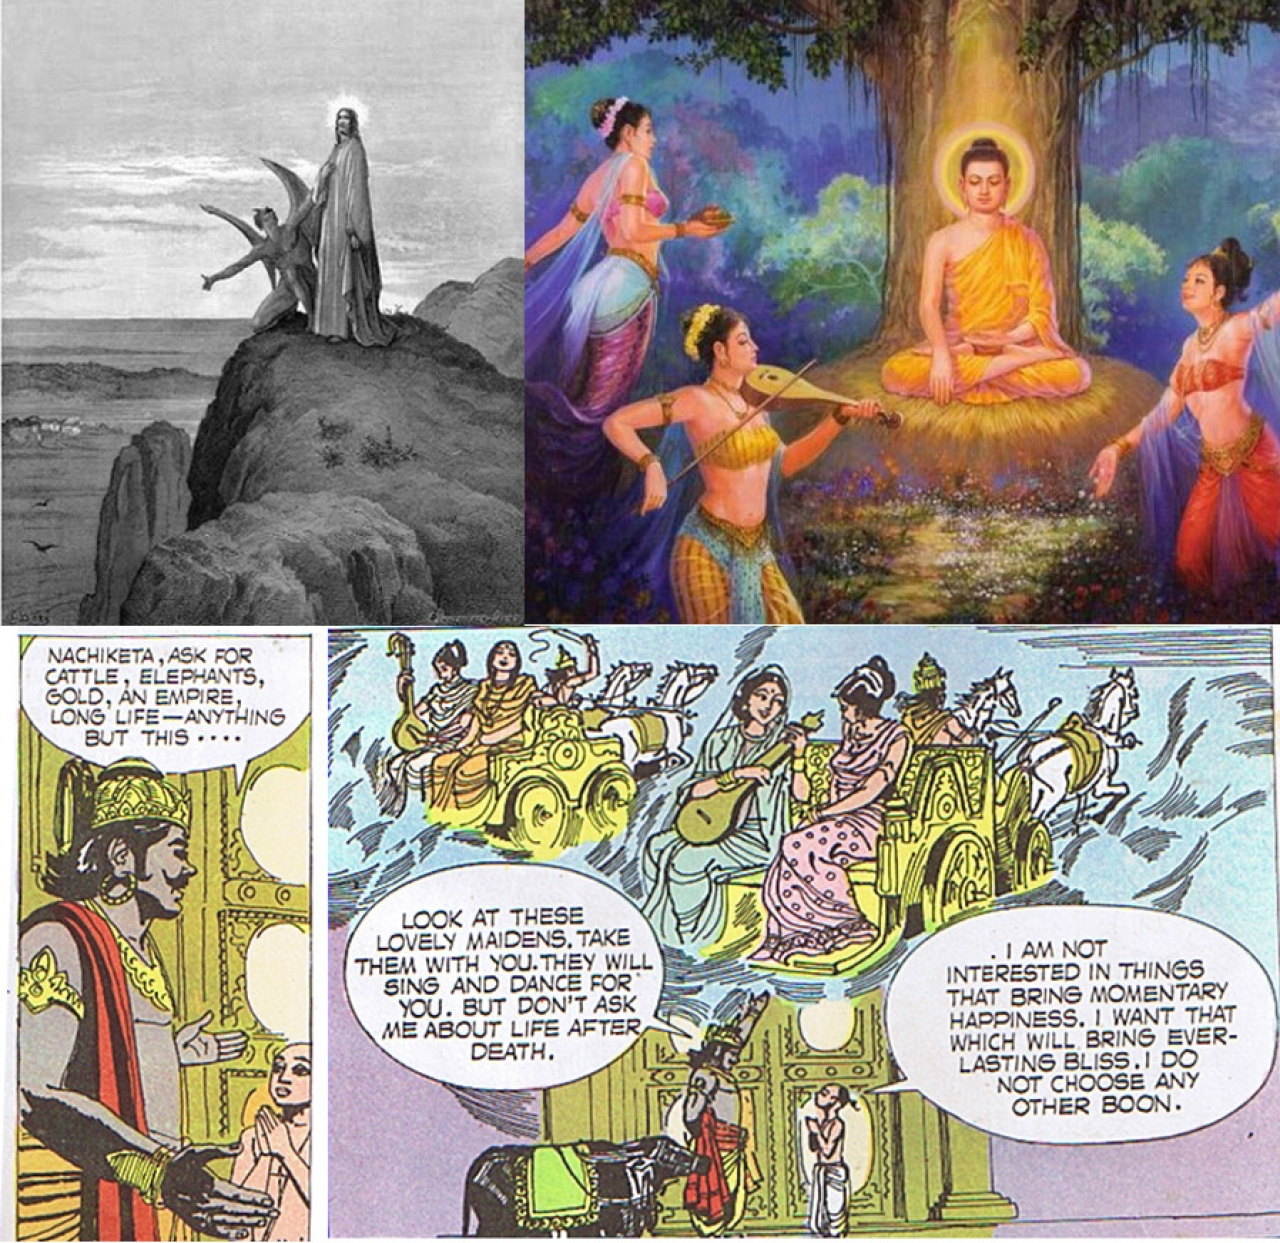 Temptation of Jesus by Satan; Temptation of Buddha by Mara and Yama tempting Nachiketa